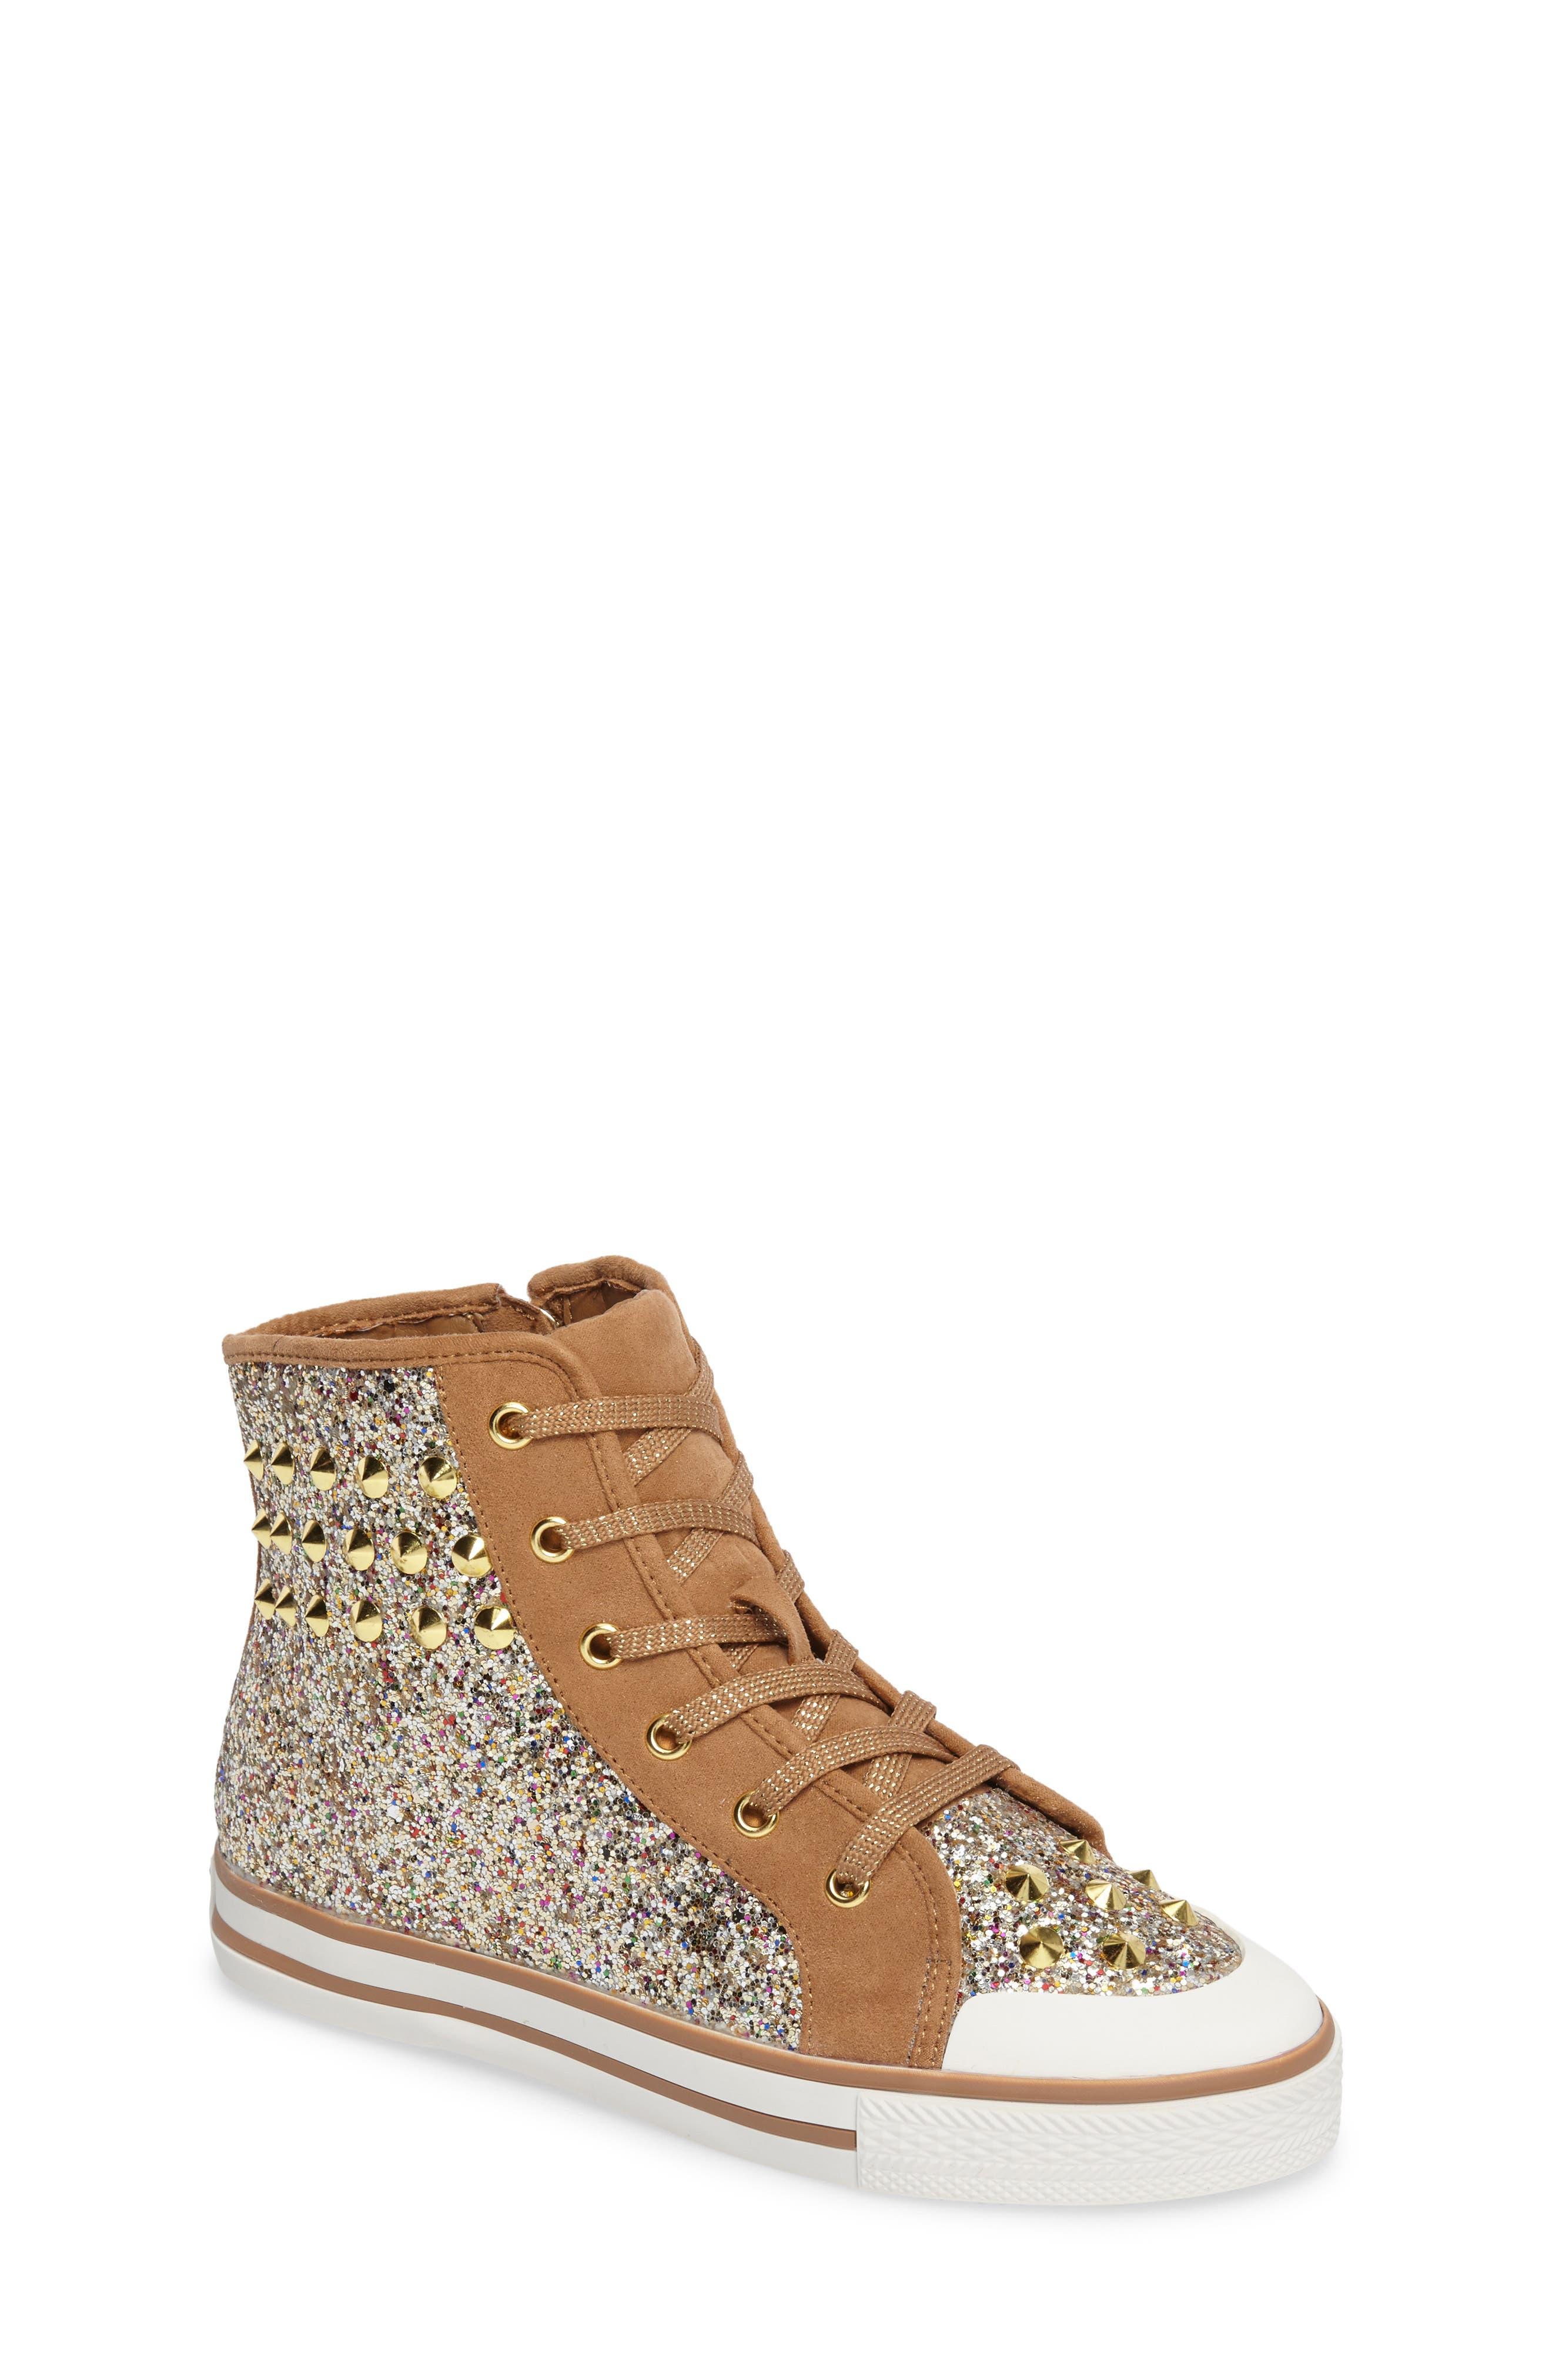 Ash Lita Roe Glittery High Top Sneaker (Toddler, Little Kid & Big Kid)